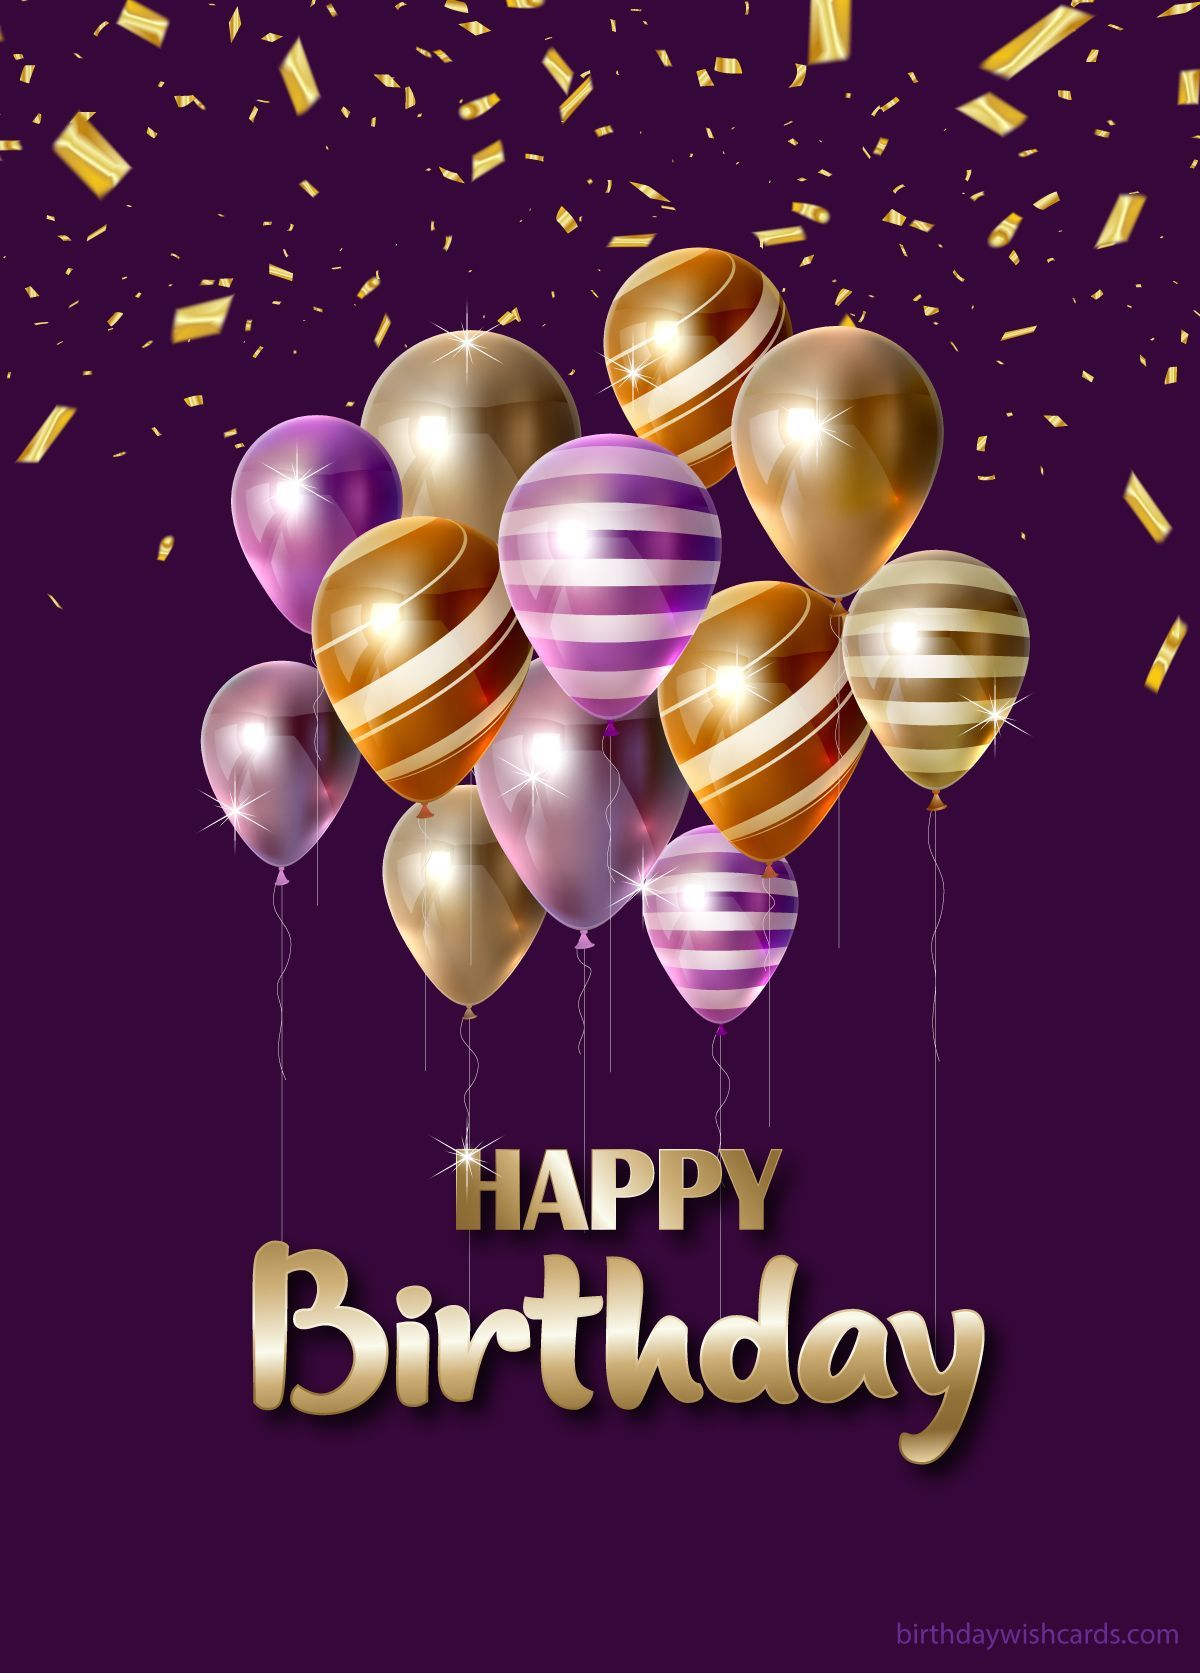 Printable Happy Birthday Card Download Birthday Card Download Floral Birthday Greeting Card In 2021 Birthday Wishes Flowers Happy Birthday Wishes Cards Happy Birthday Wishes Images